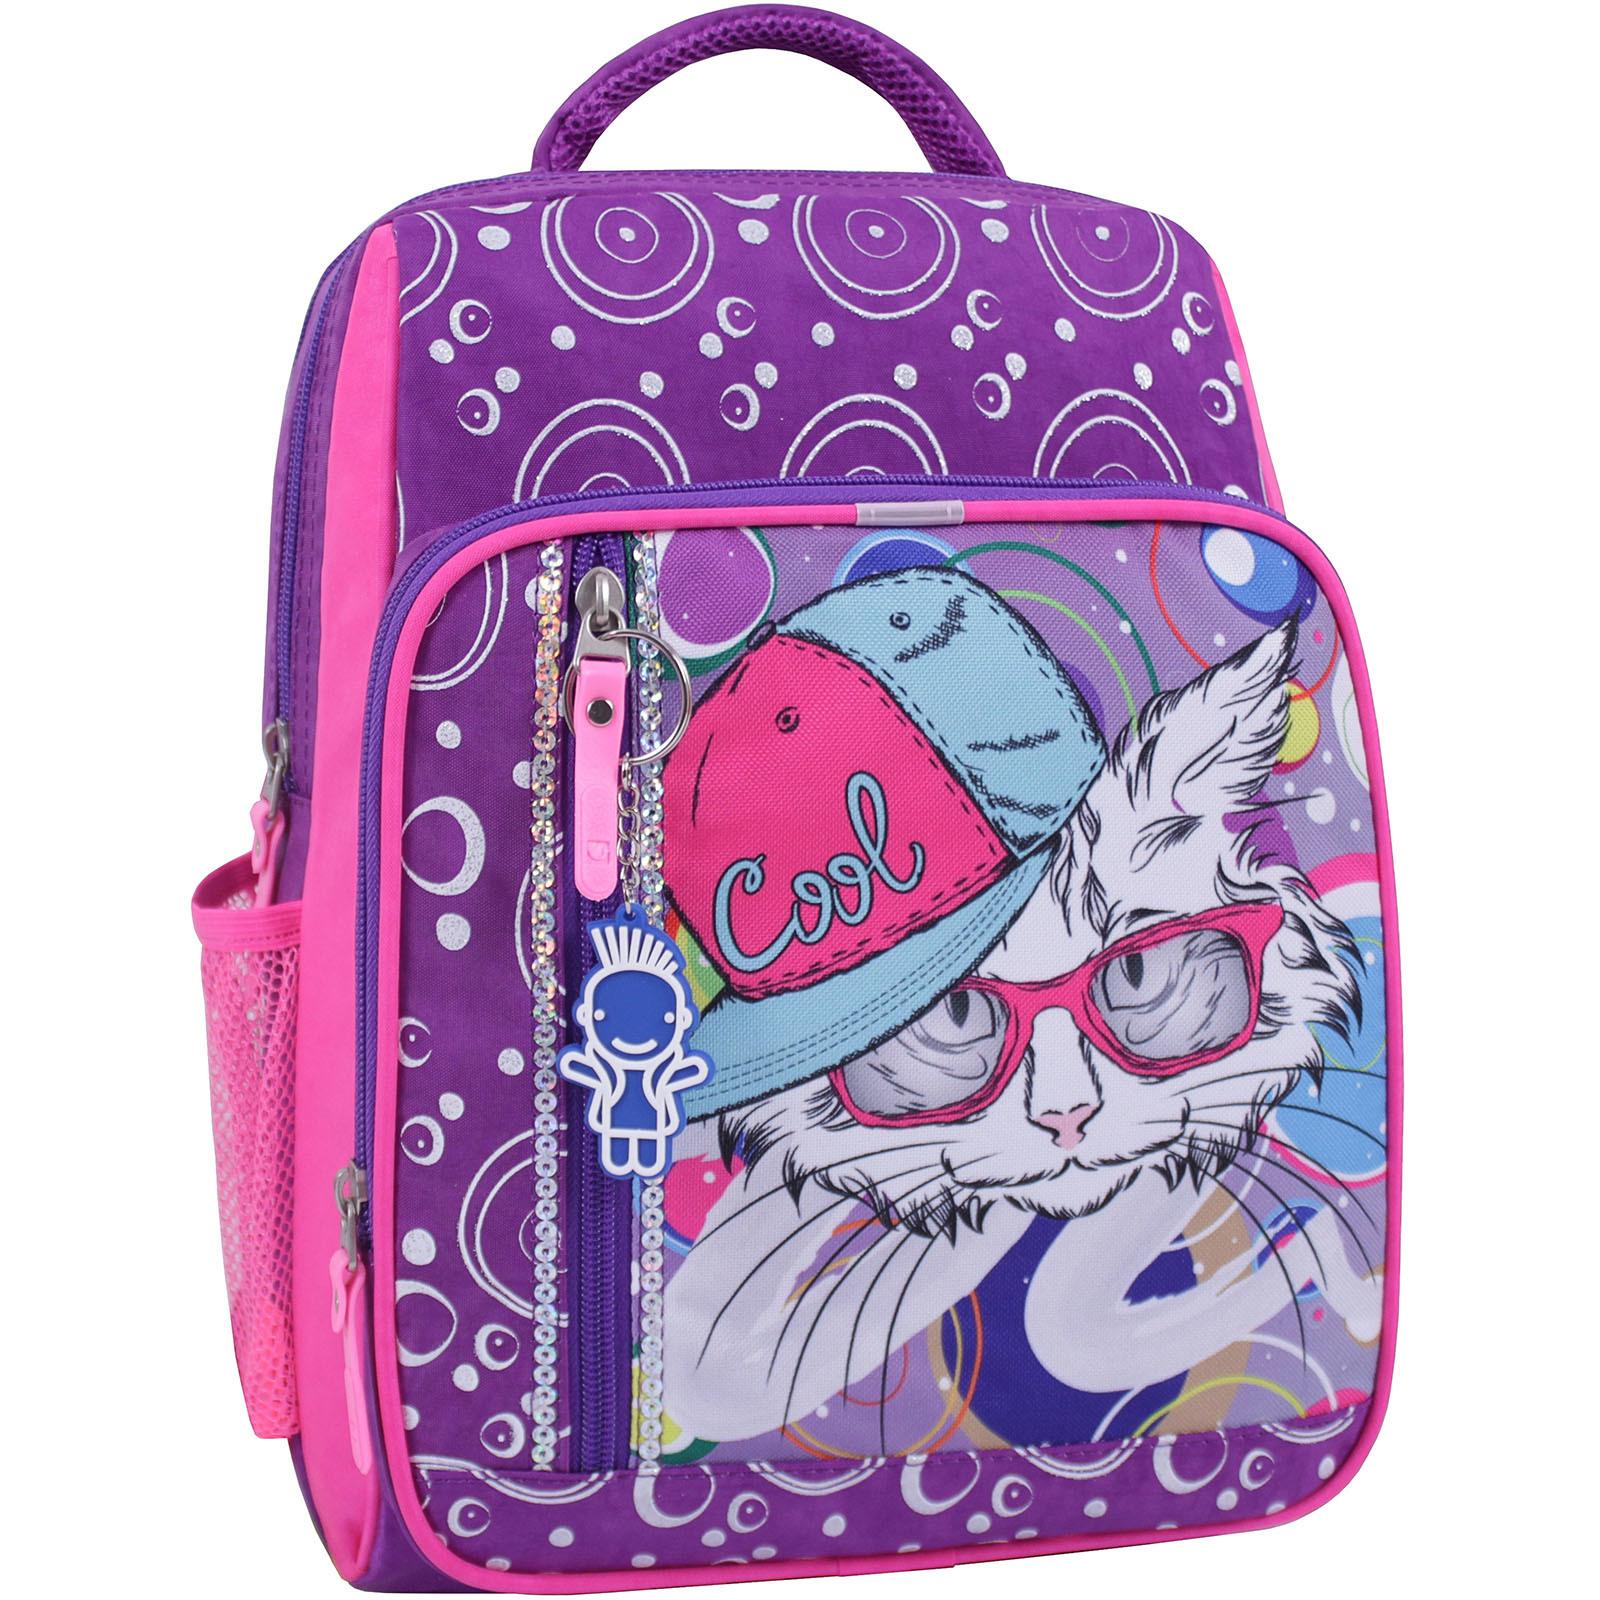 Школьные рюкзаки Рюкзак школьный Bagland Школьник 8 л. фиолетовый 501 (0012870) IMG_1069_суб.501_.JPG